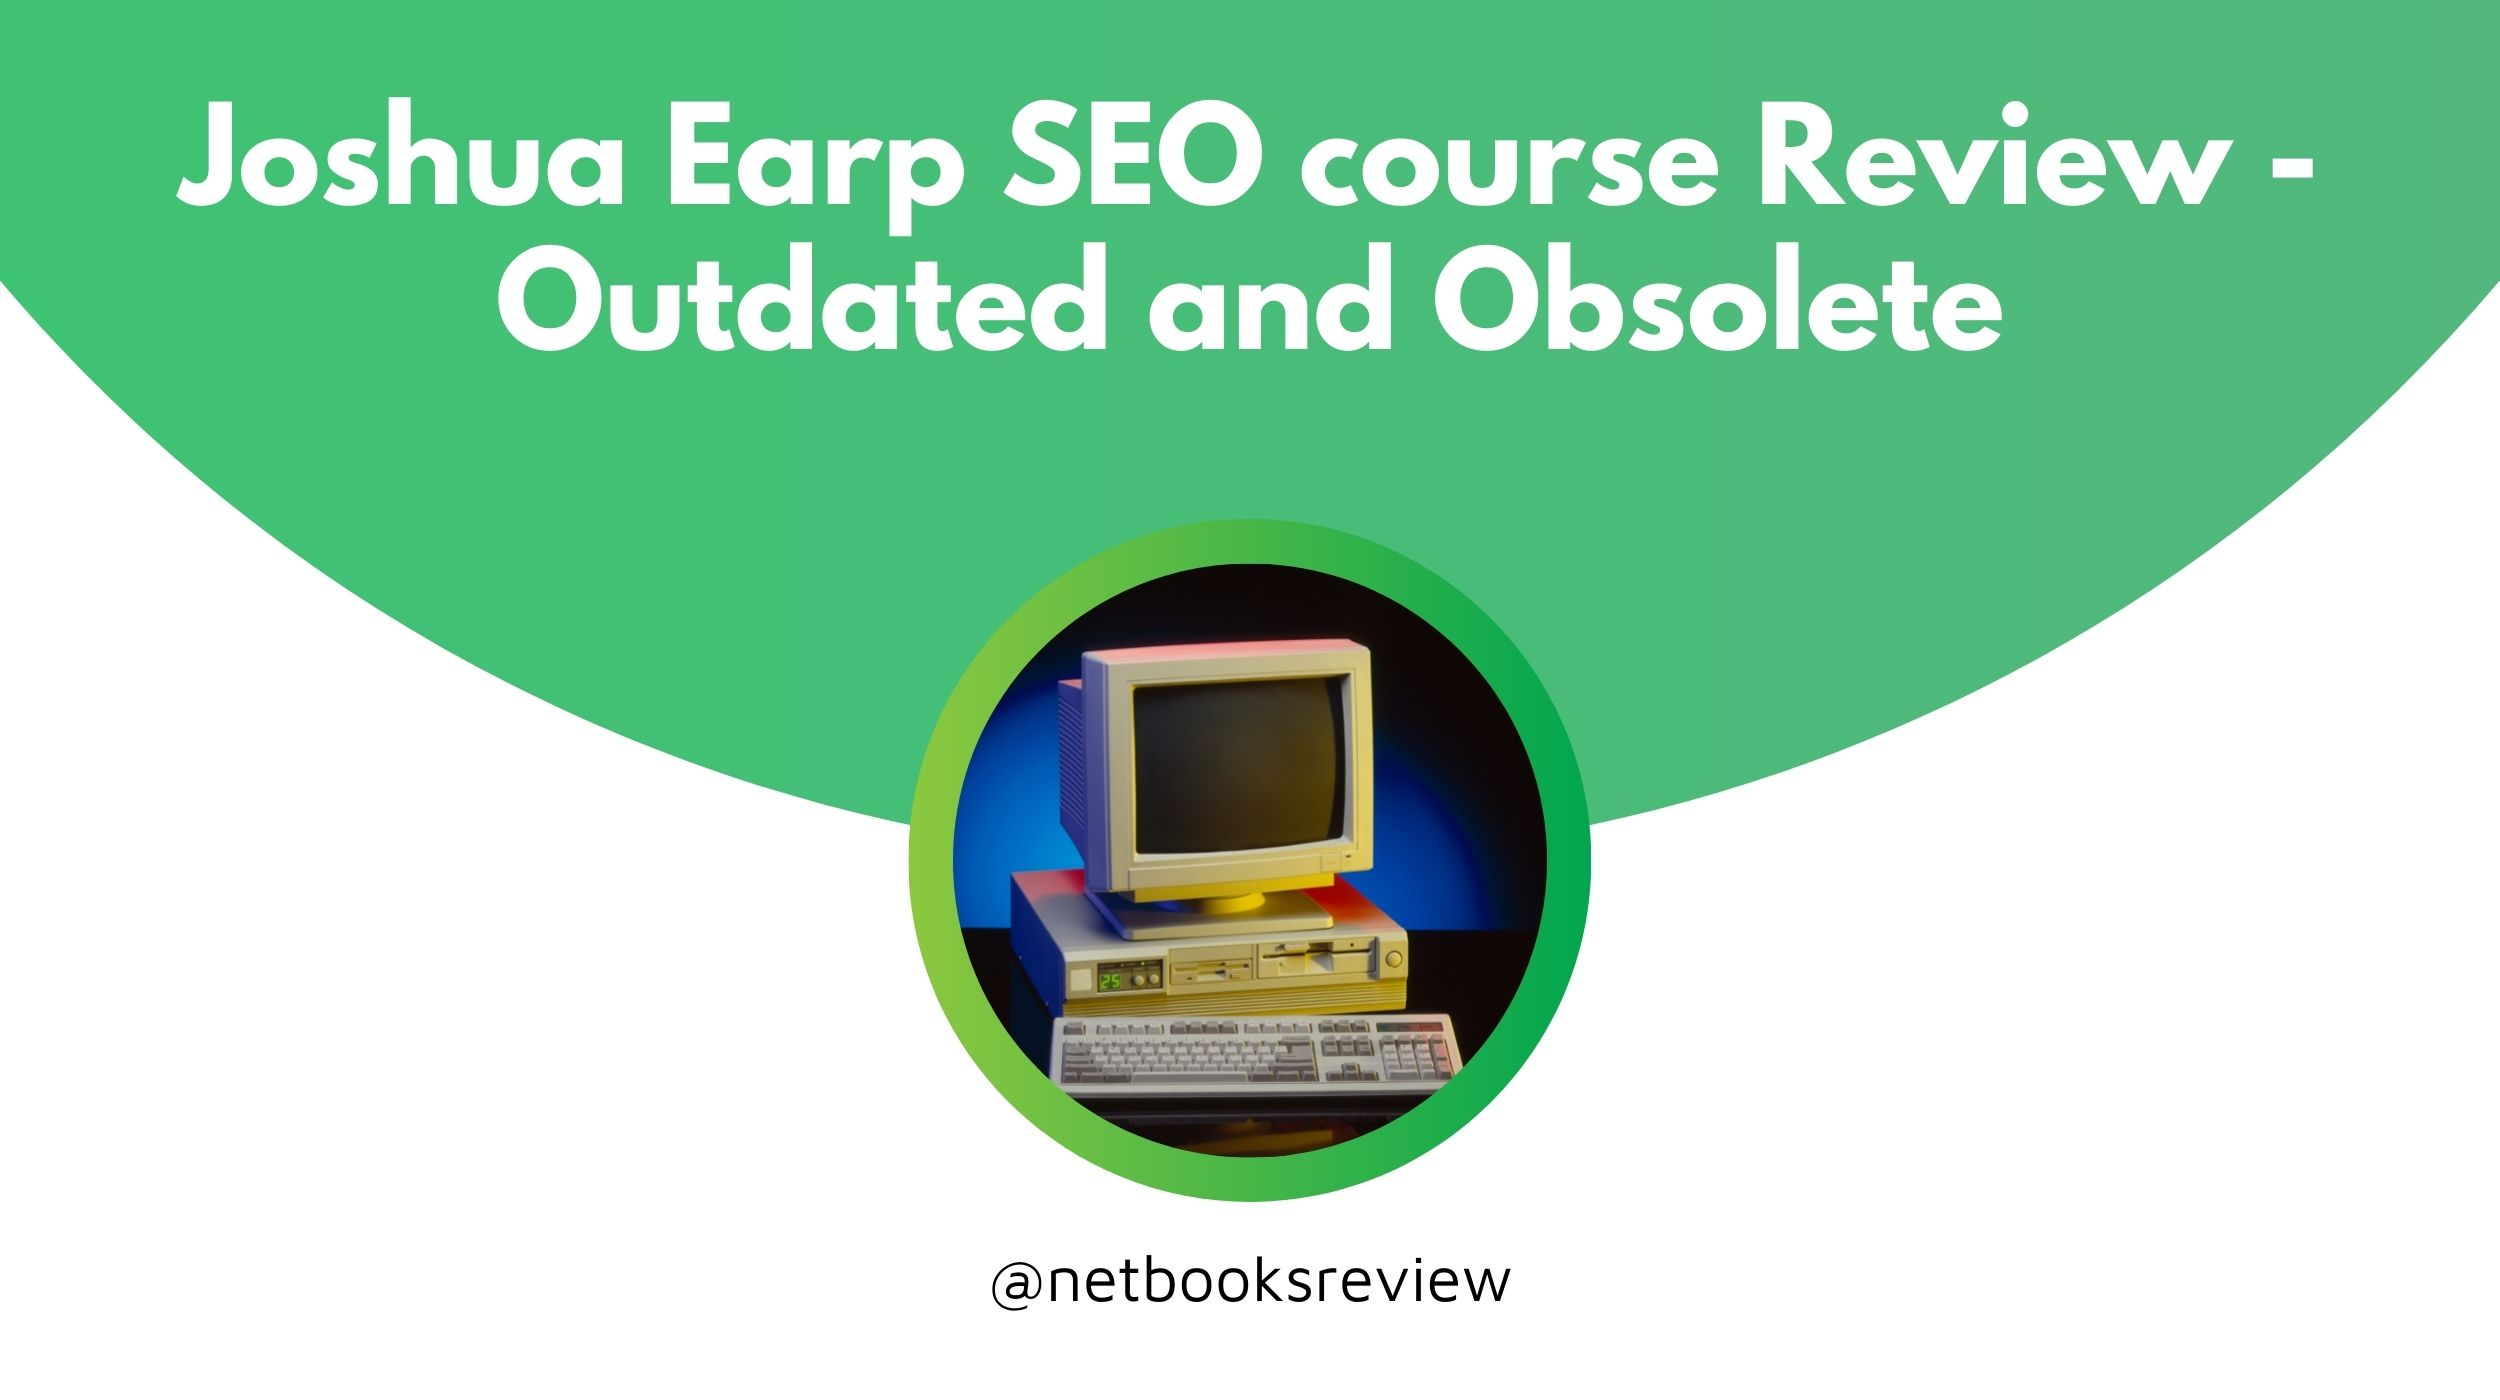 Joshua earp seo course review